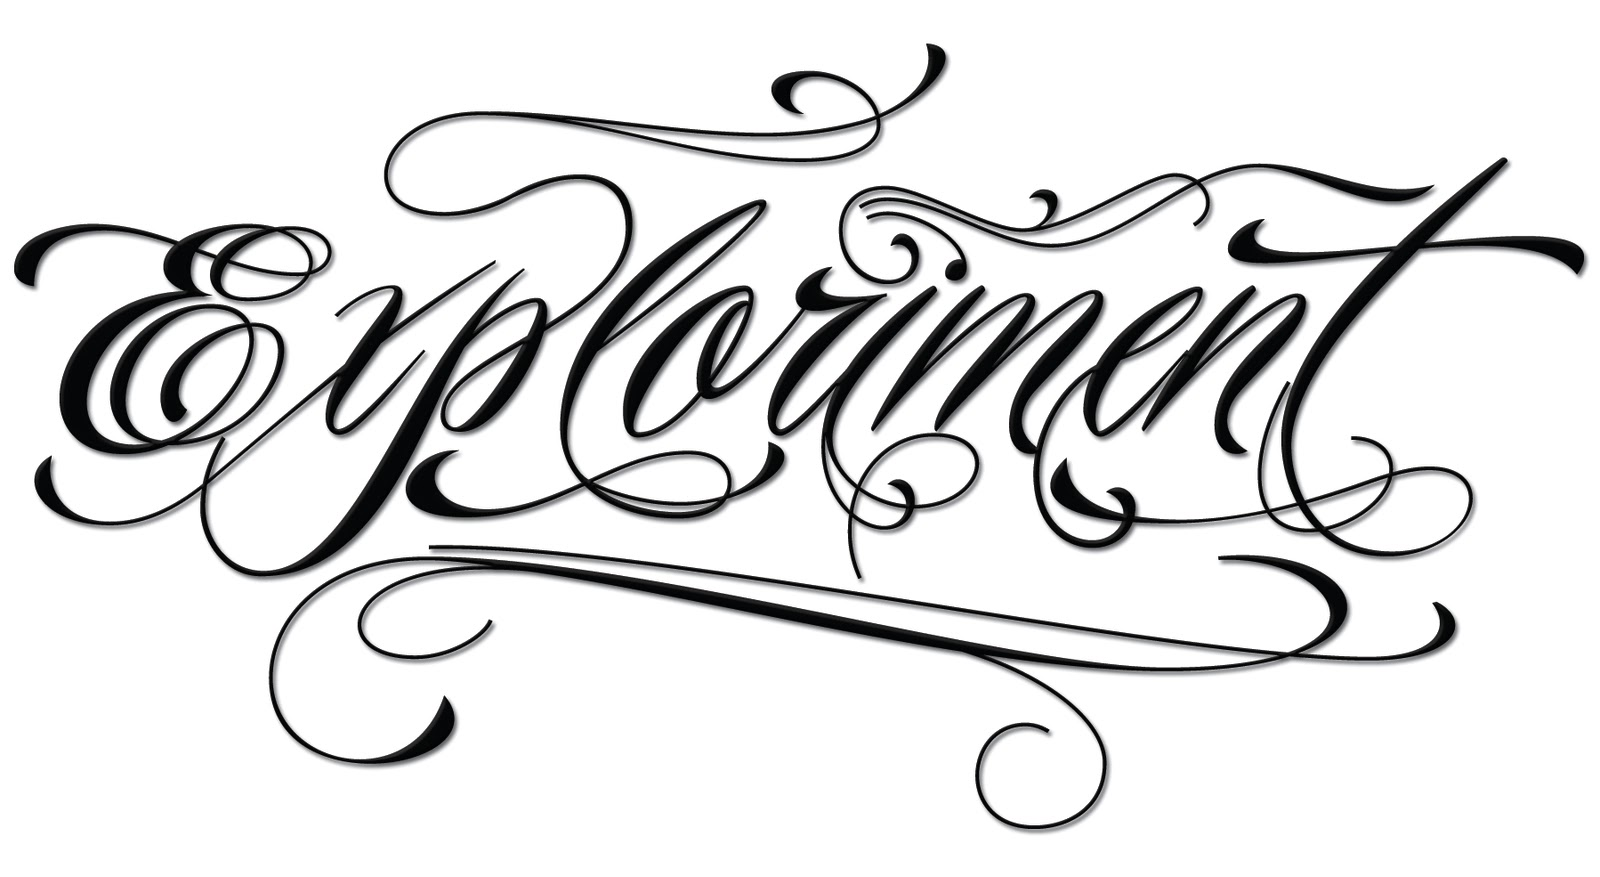 Exploriment piel script Calligraphy books free